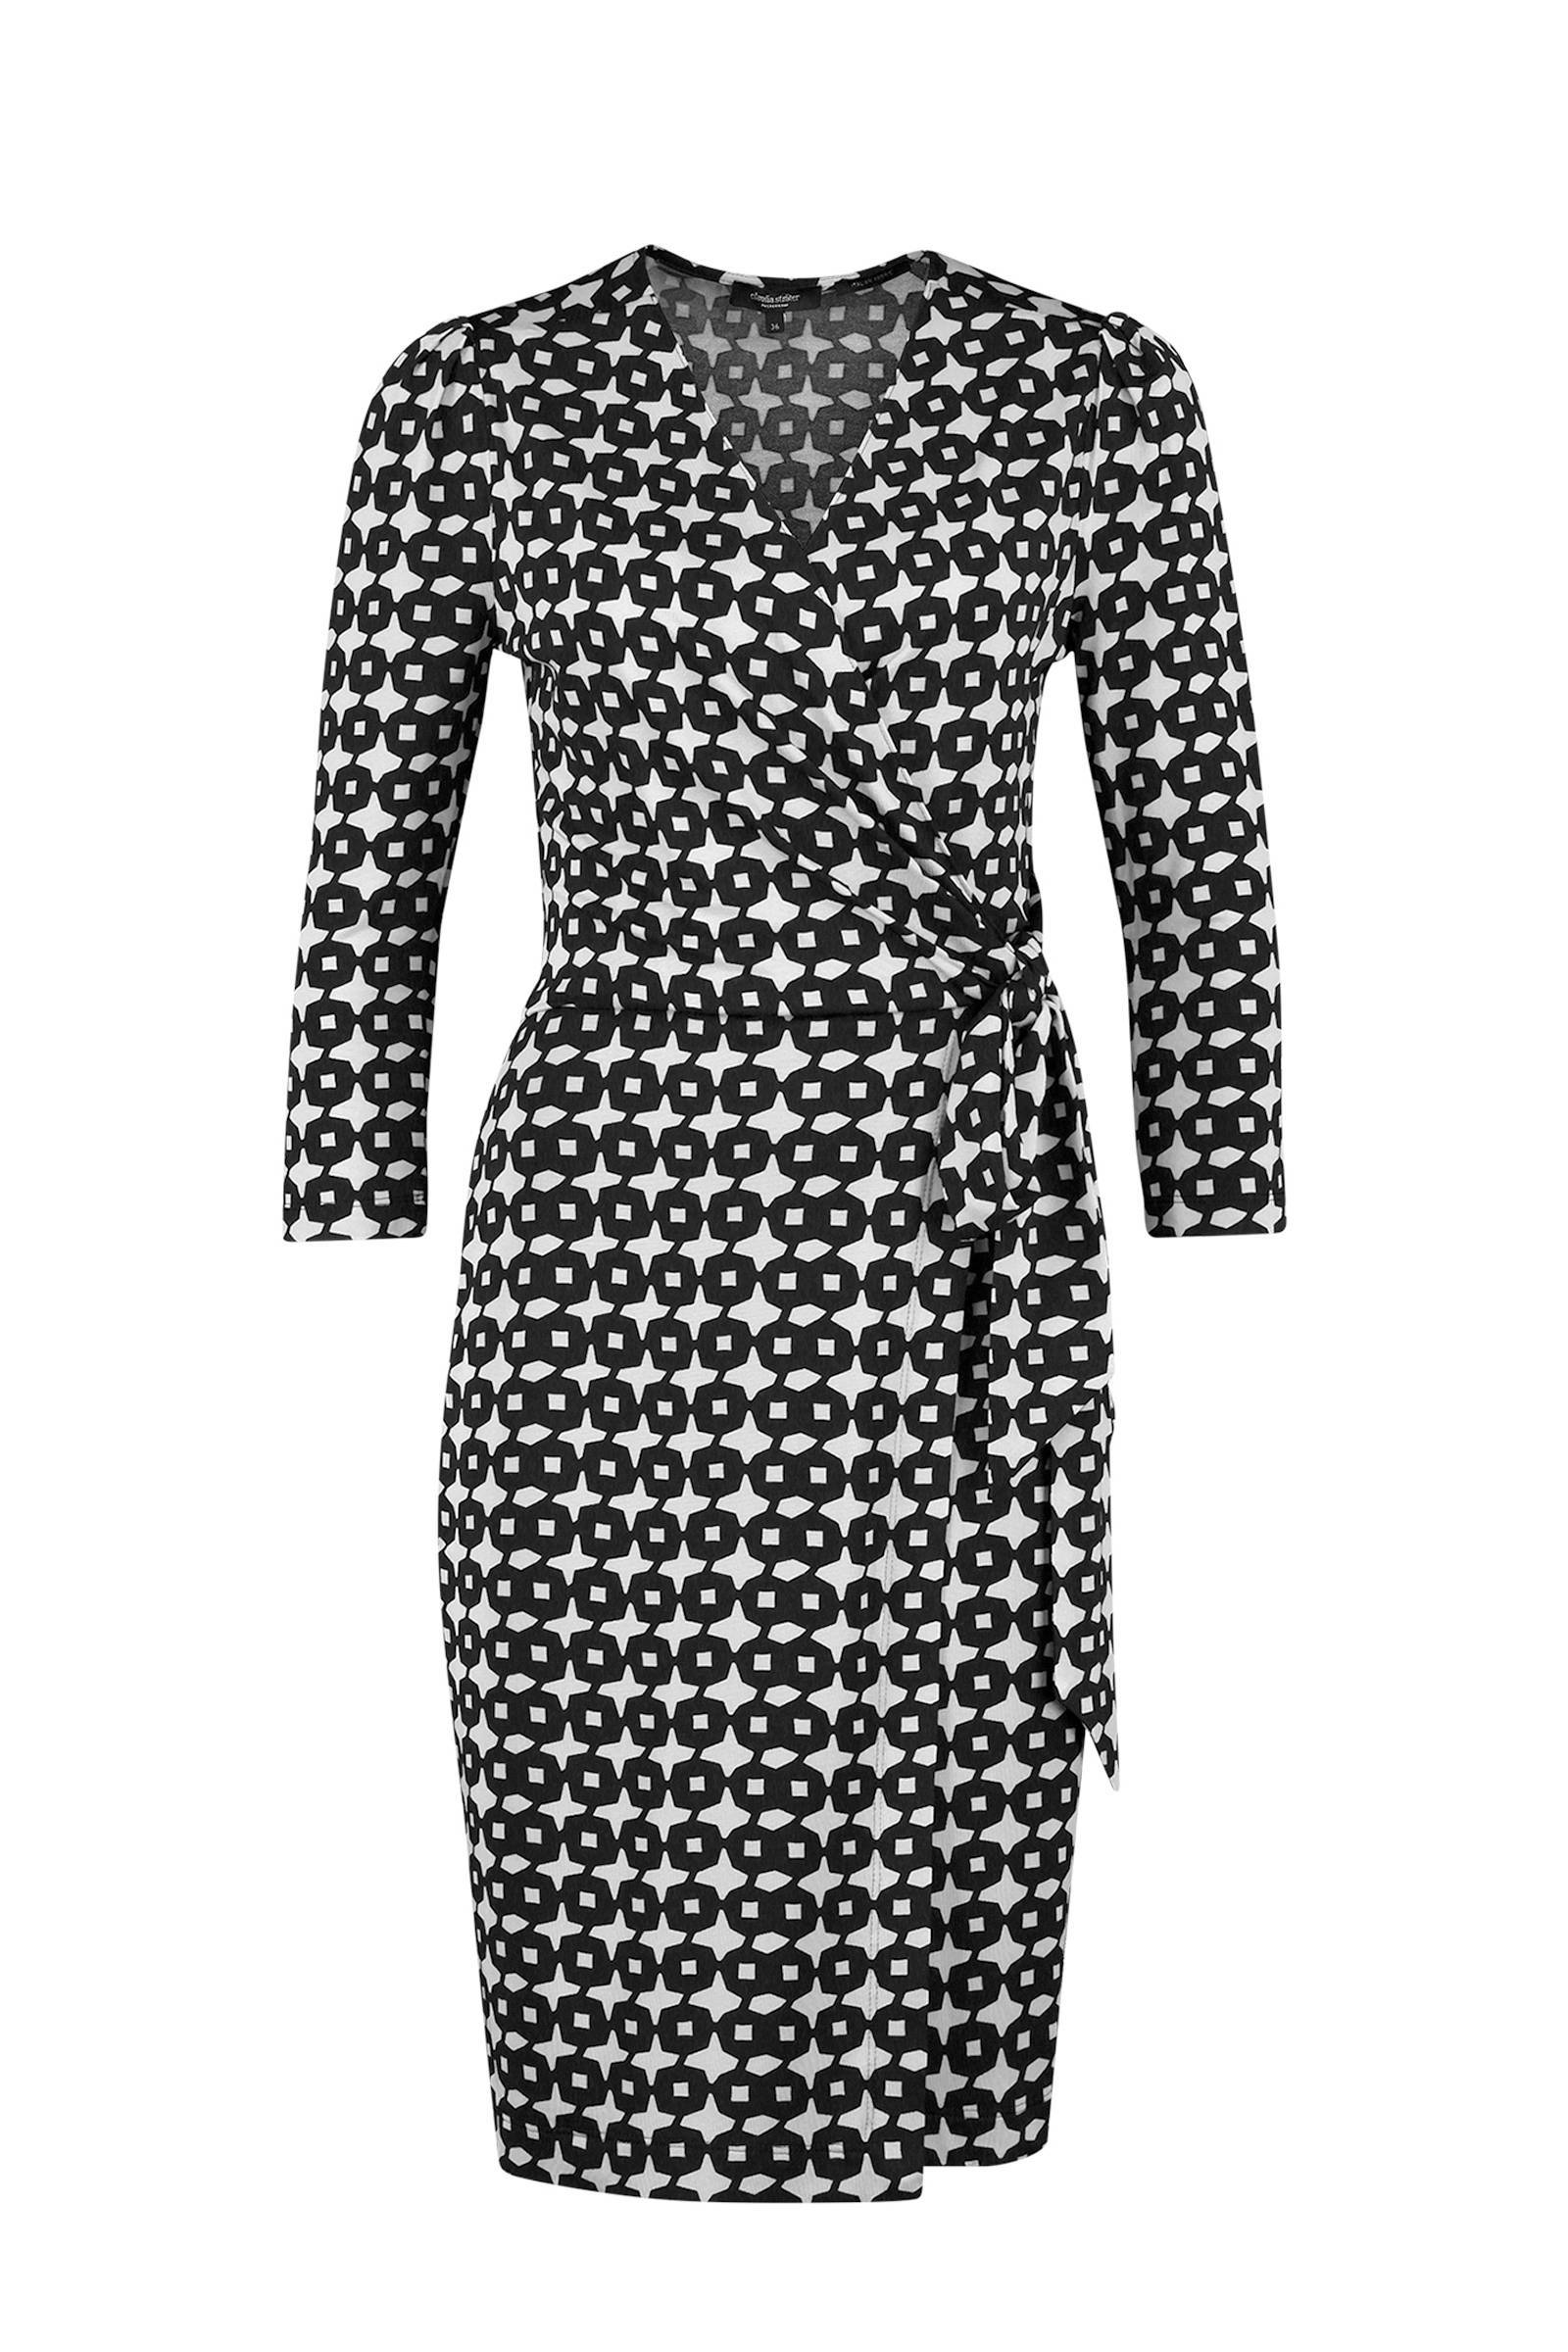 Claudia Sträter jurk met ruitdessin zwart